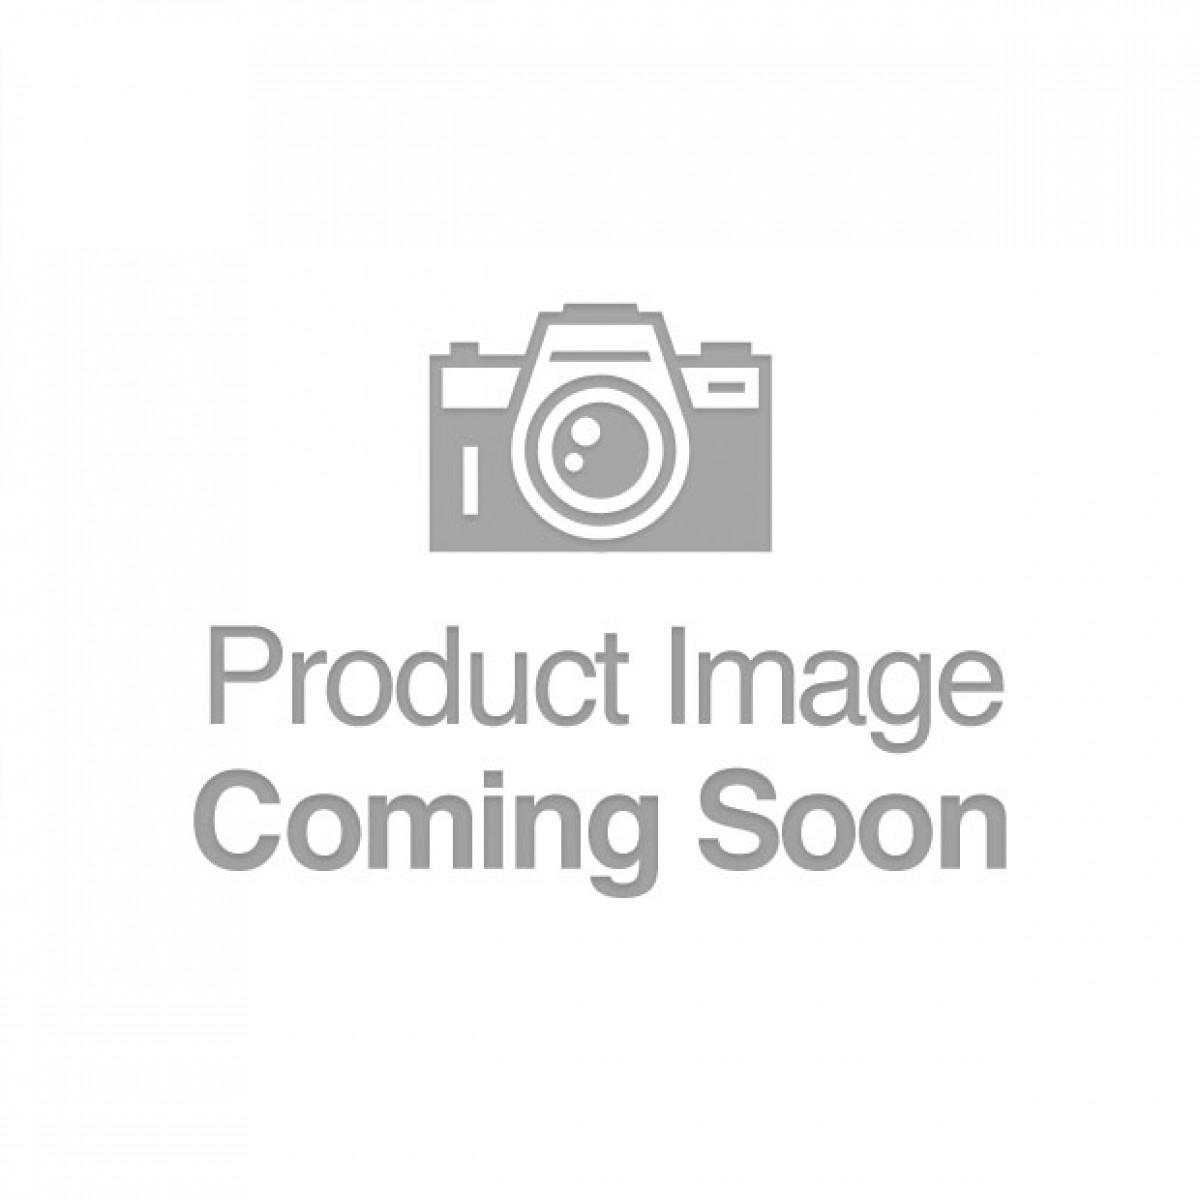 Kiiroo Onyx+ & Pearl2 Interactive Masturbator/Vibrator Kit - Black